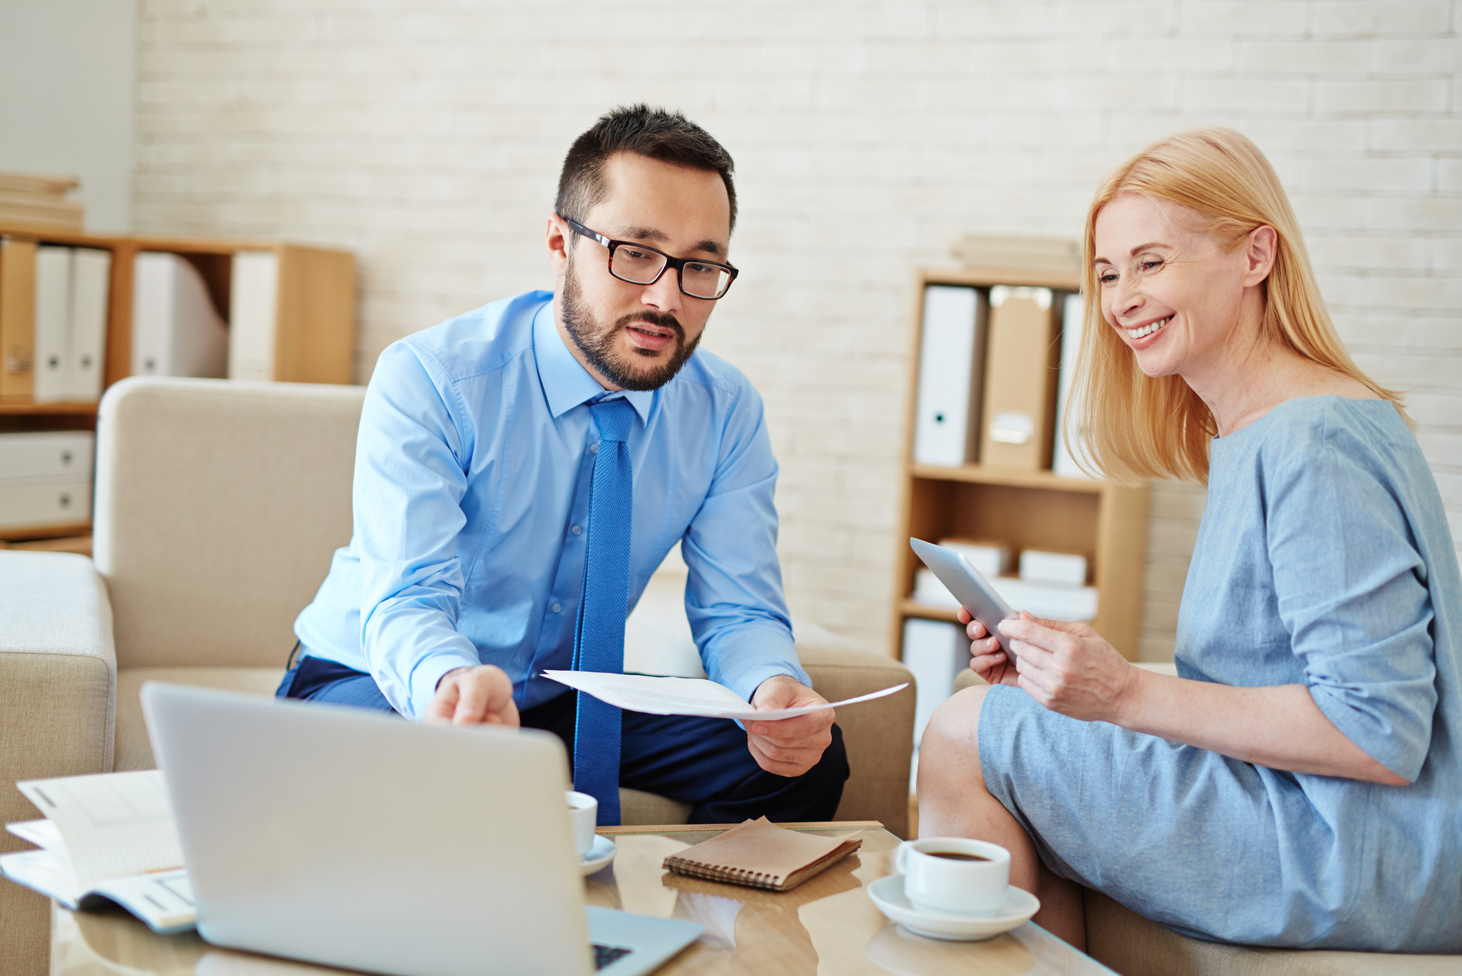 man woman computer meeting client tax accountant